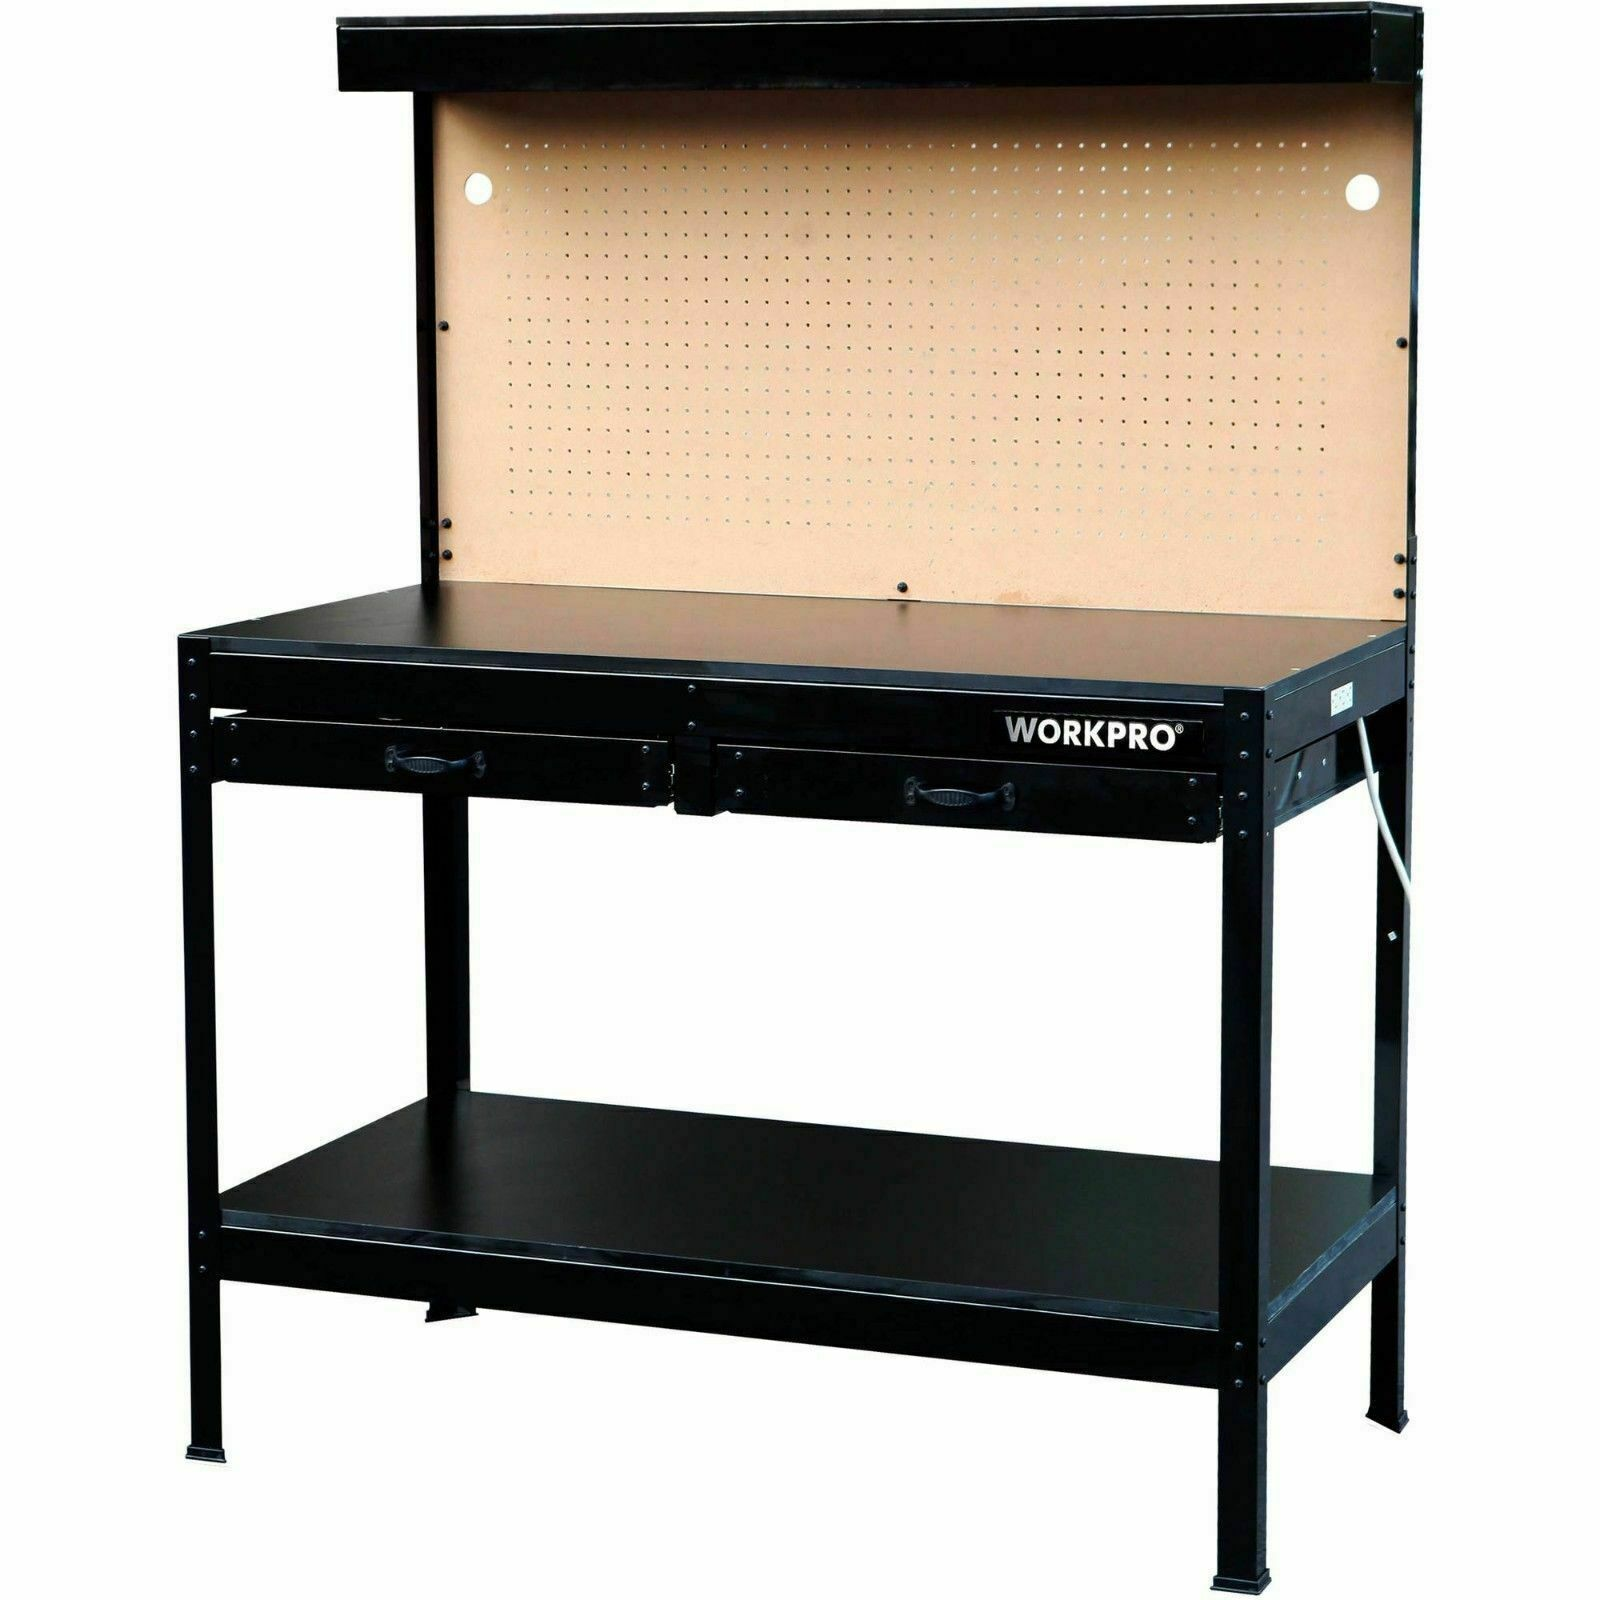 Workpro Multi Purpose Workbench With Work Light Steel Frame Tool Storage Garage